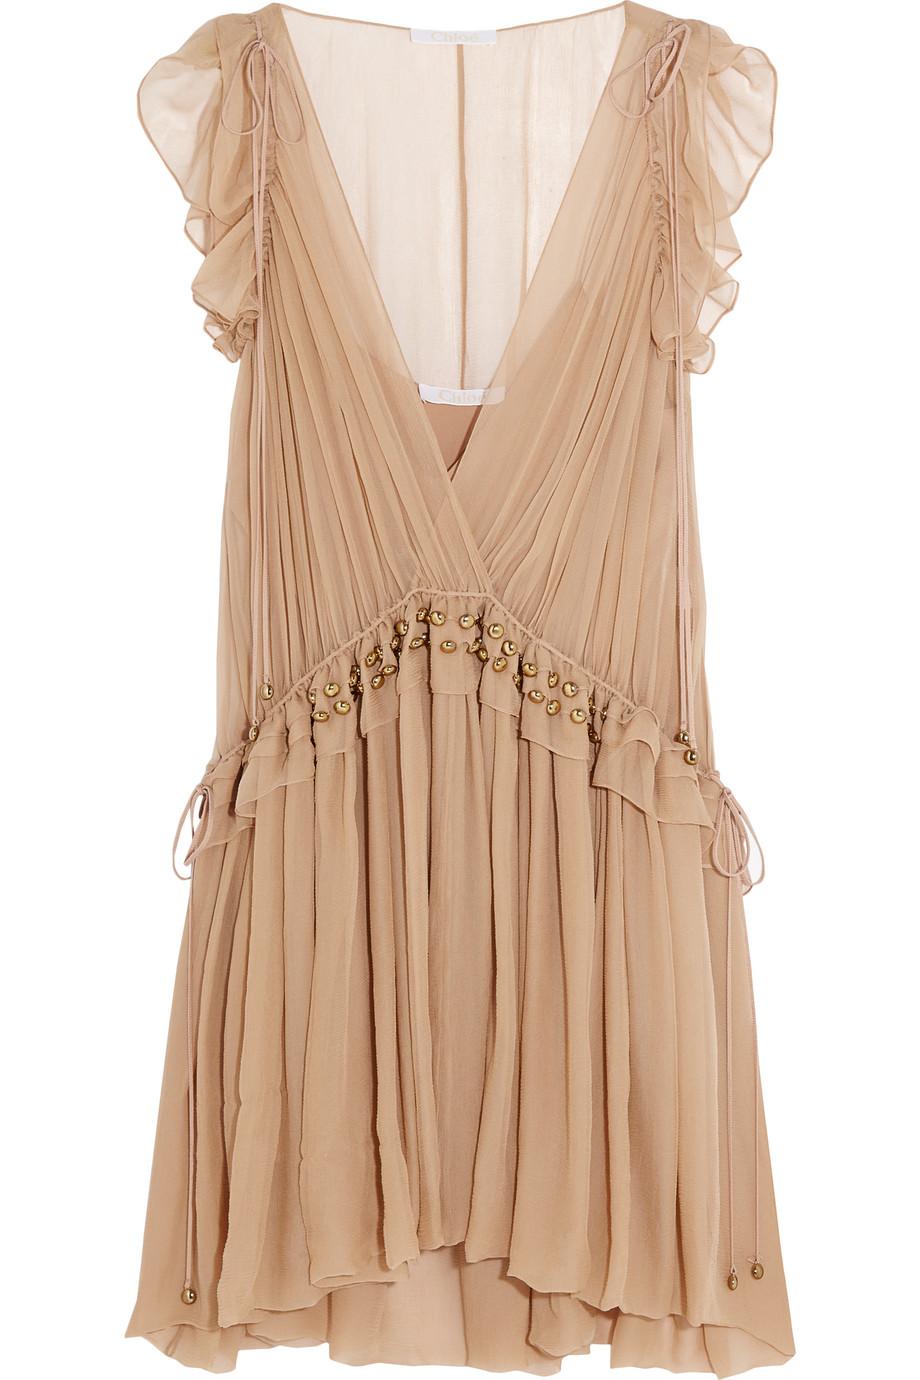 Chloé Ruffled Silk-Chiffon Mini Dress, Blush, Women's, Size: 38